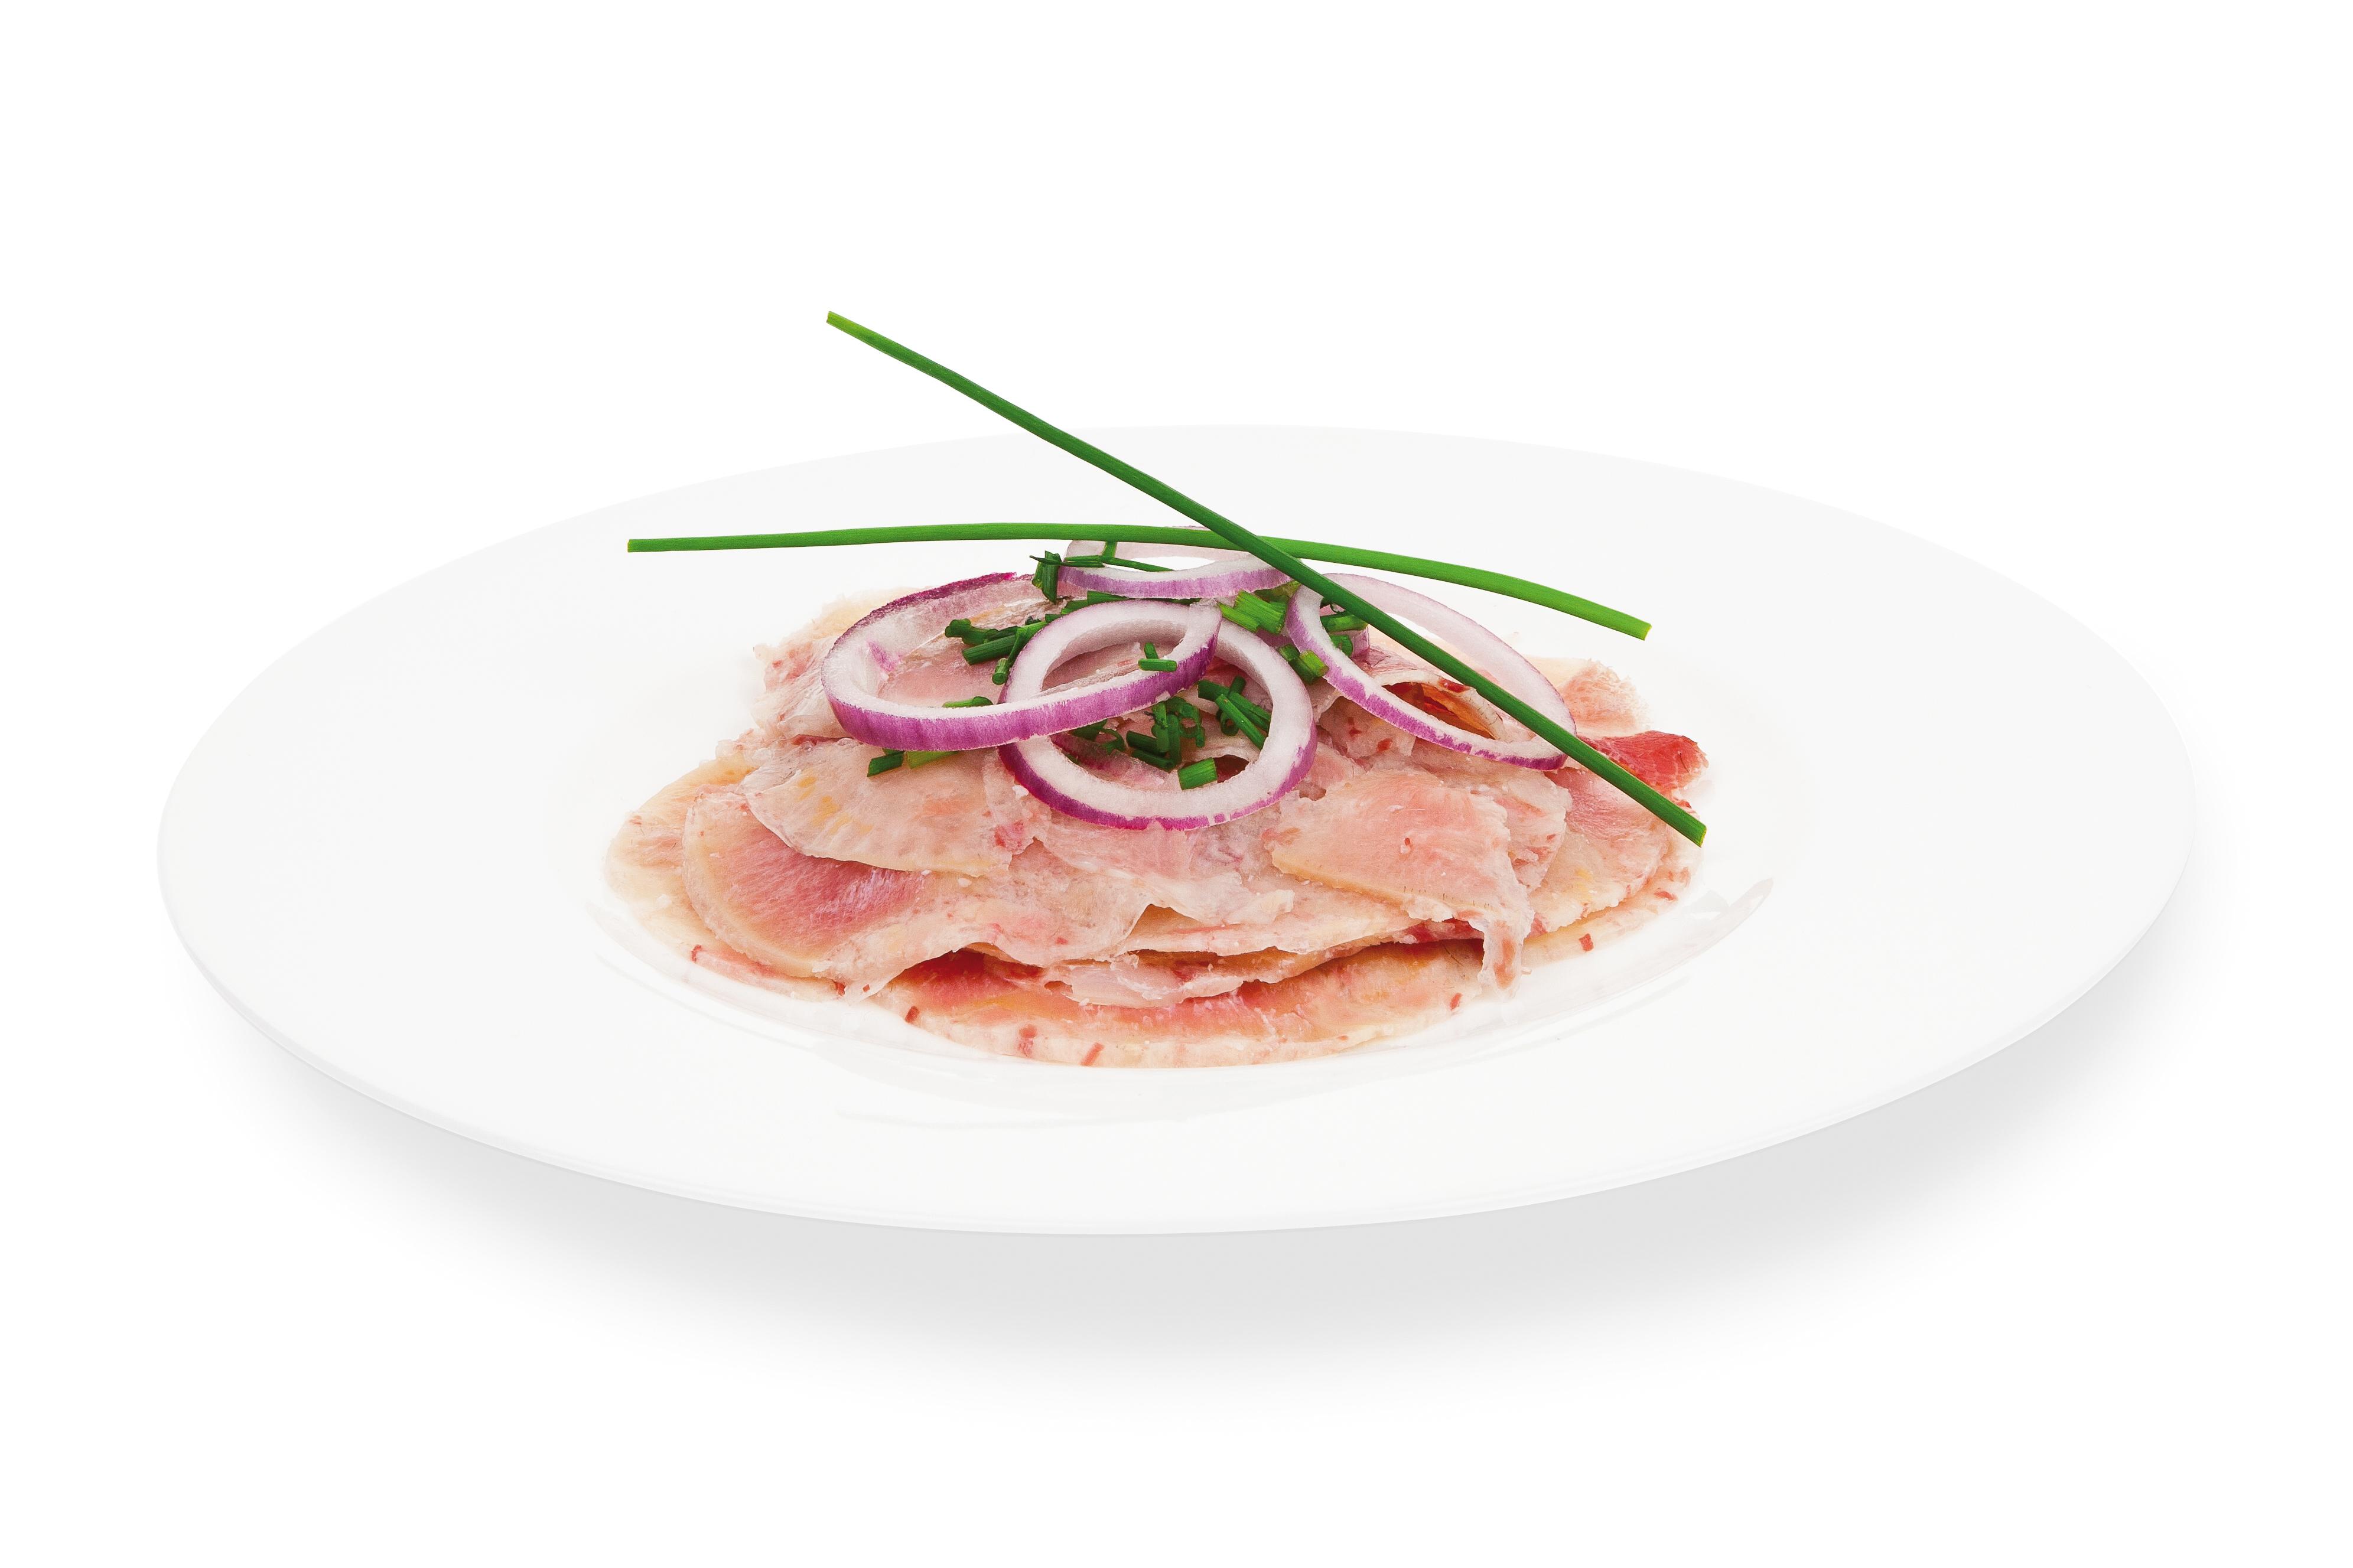 Foodfotografie für Hilcona AG